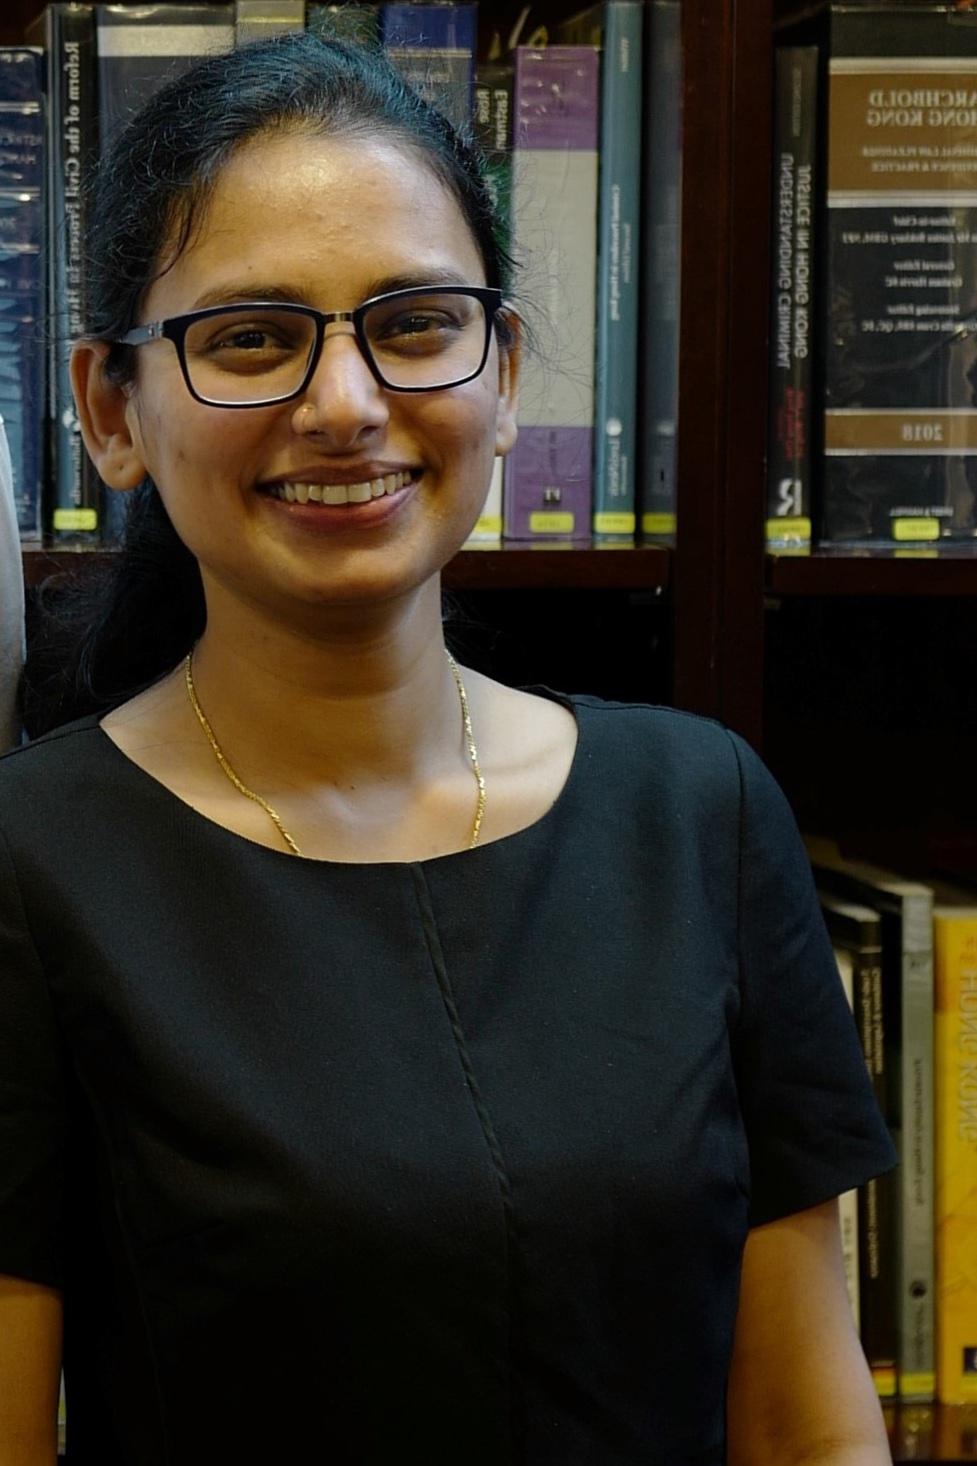 Amee Dharamshi